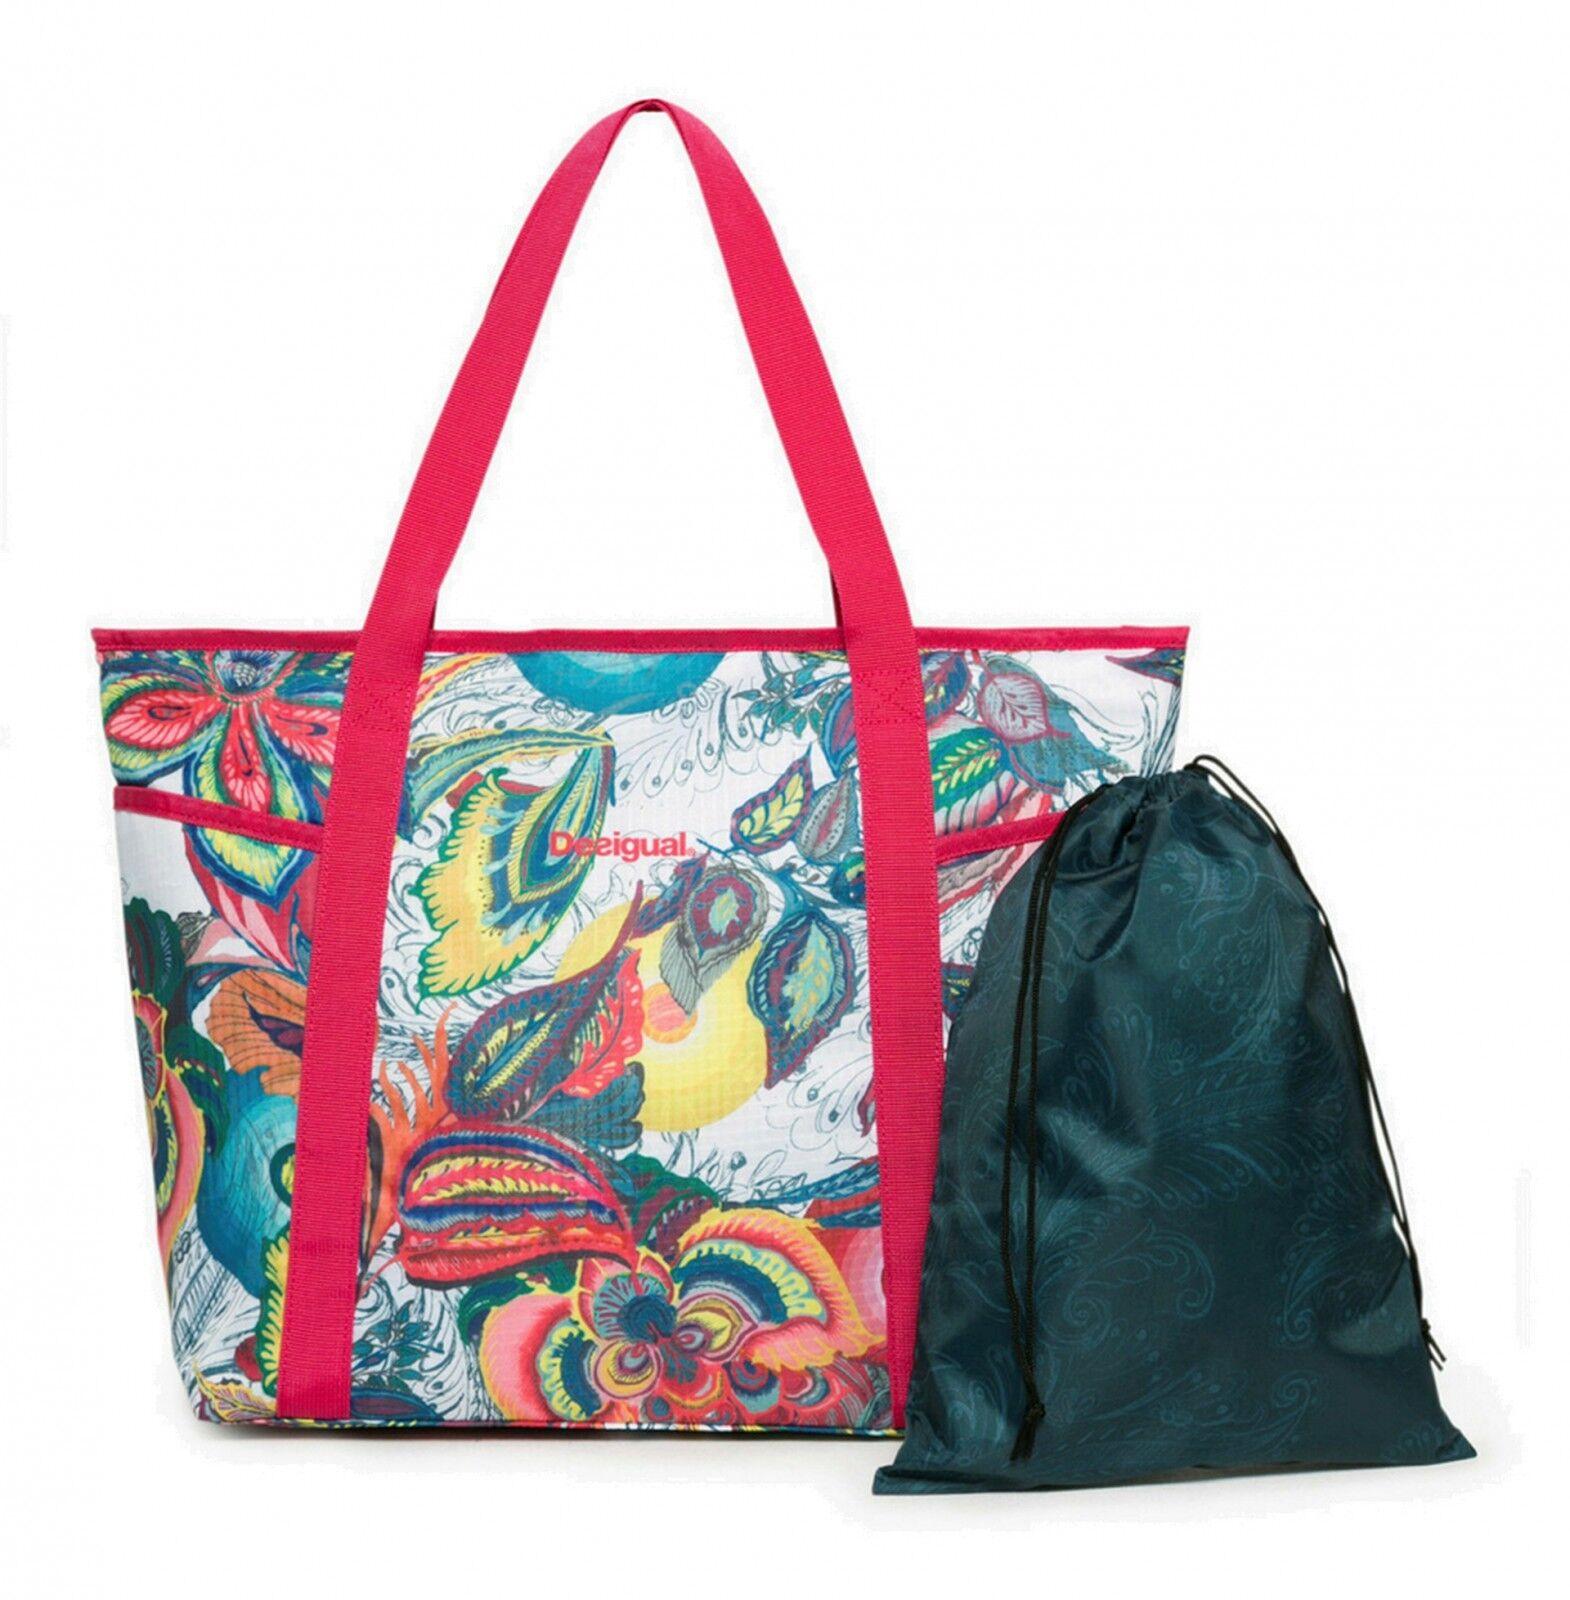 Desigual Sports Bag Galactic Bloom Carryall